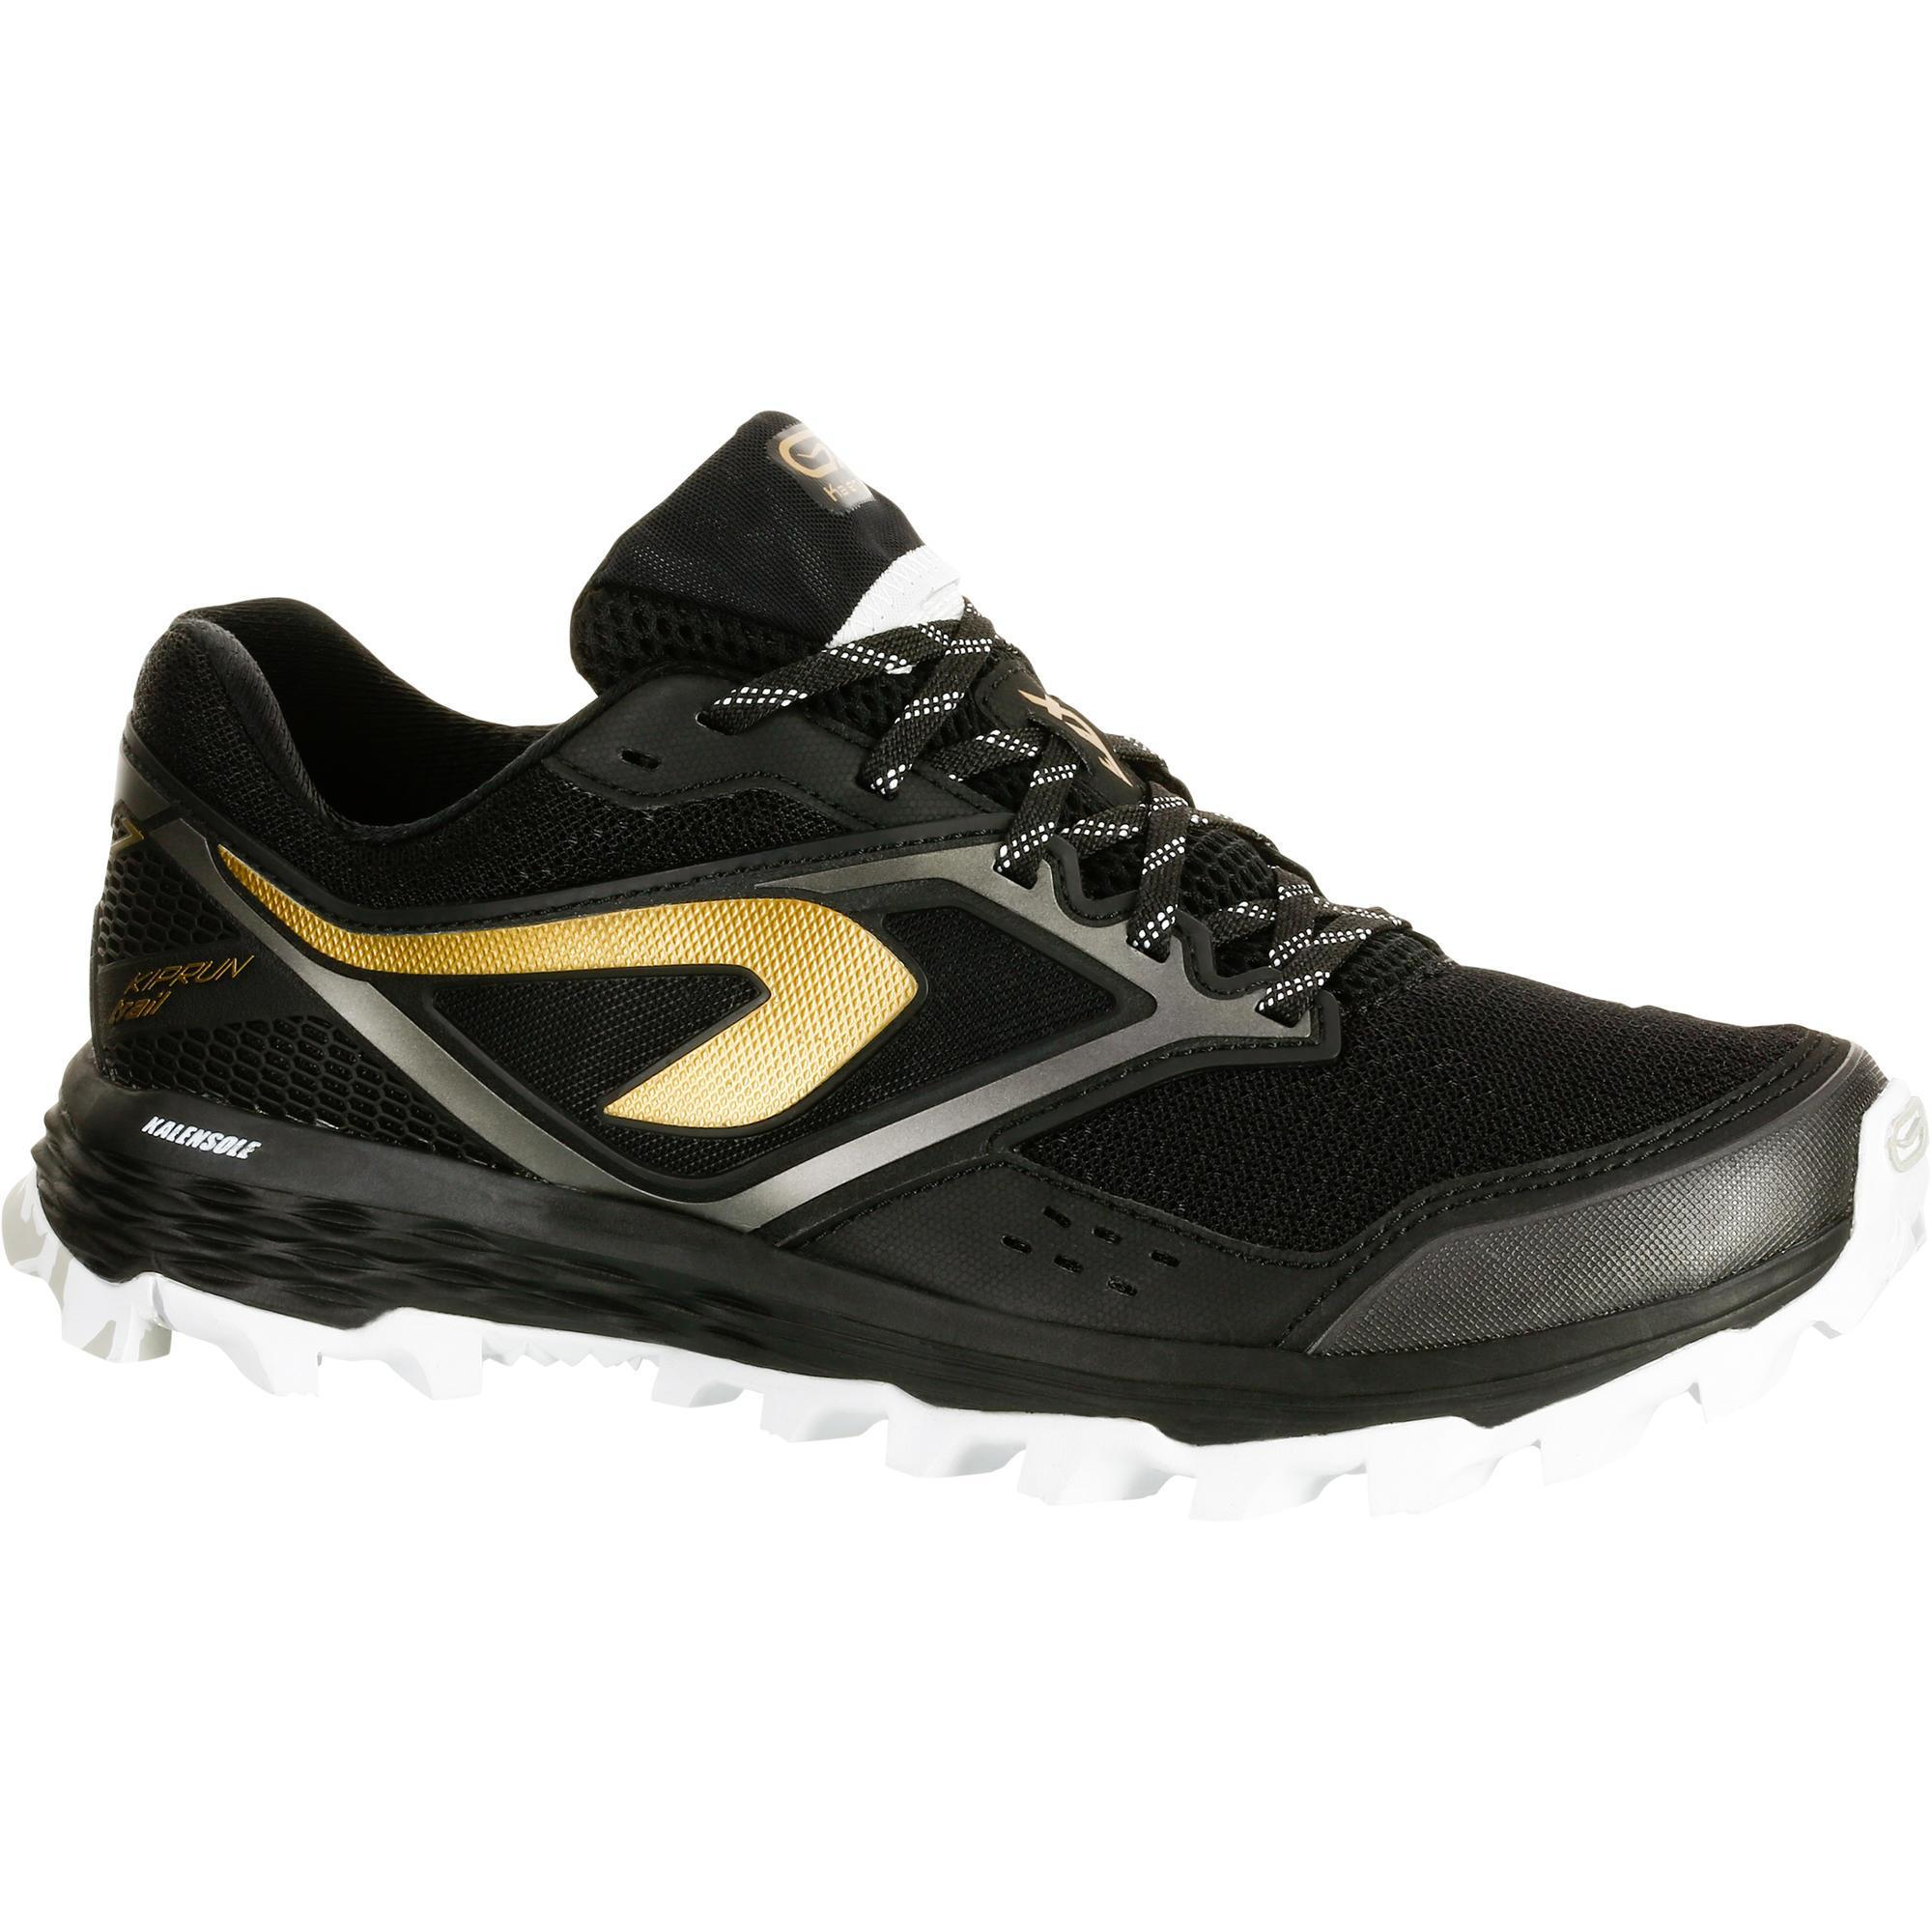 new arrival c3057 f64b5 Comprar zapatillas de trail running   Decathlon